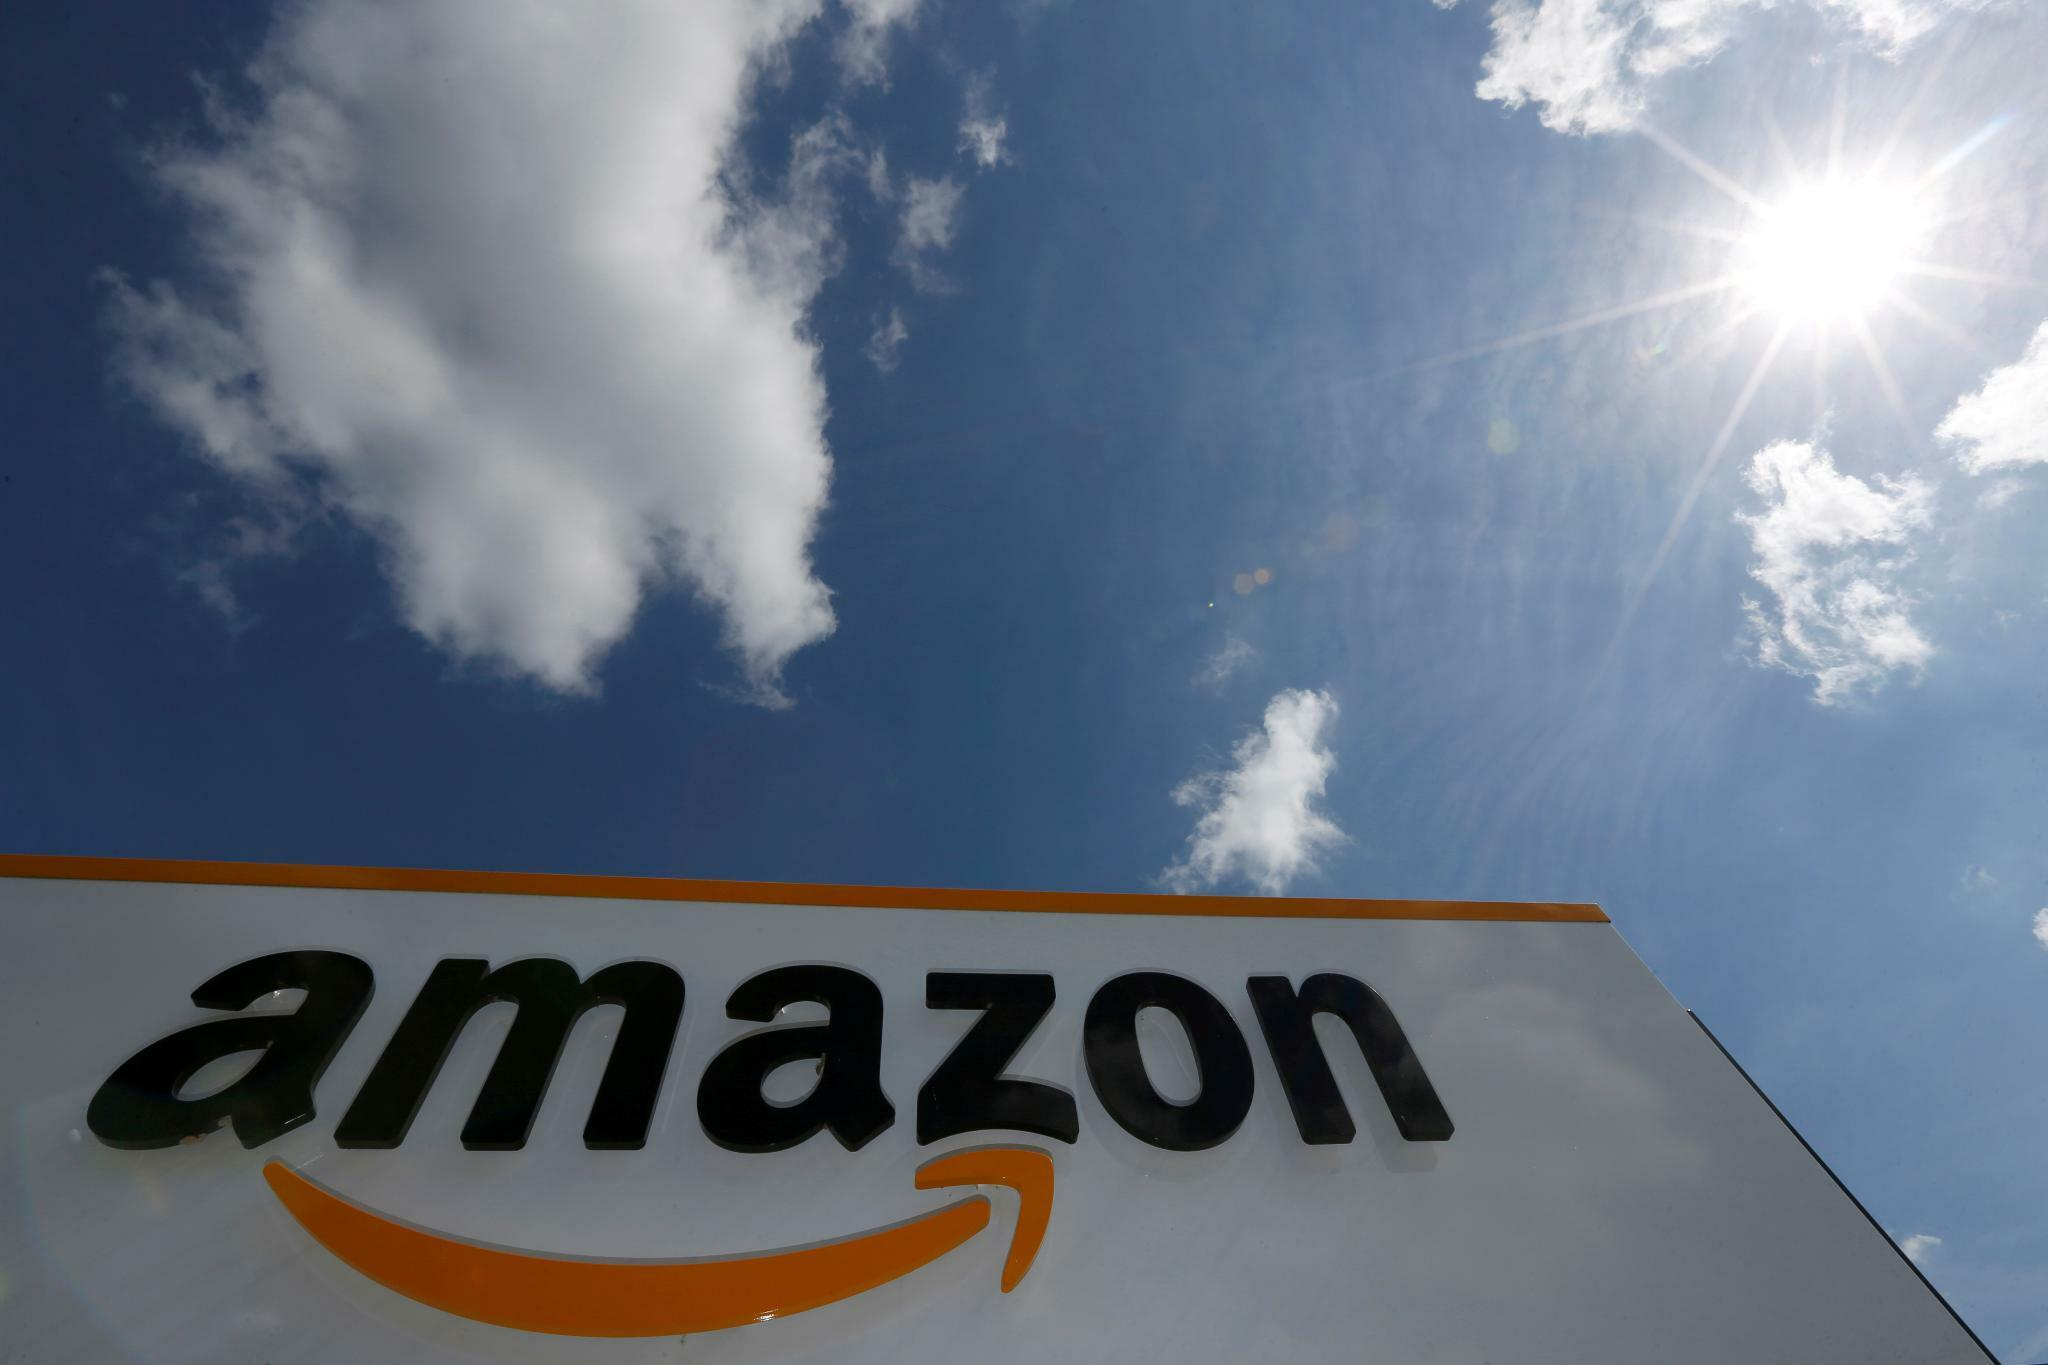 Amazon: Jeff Bezos grünes Versprechen